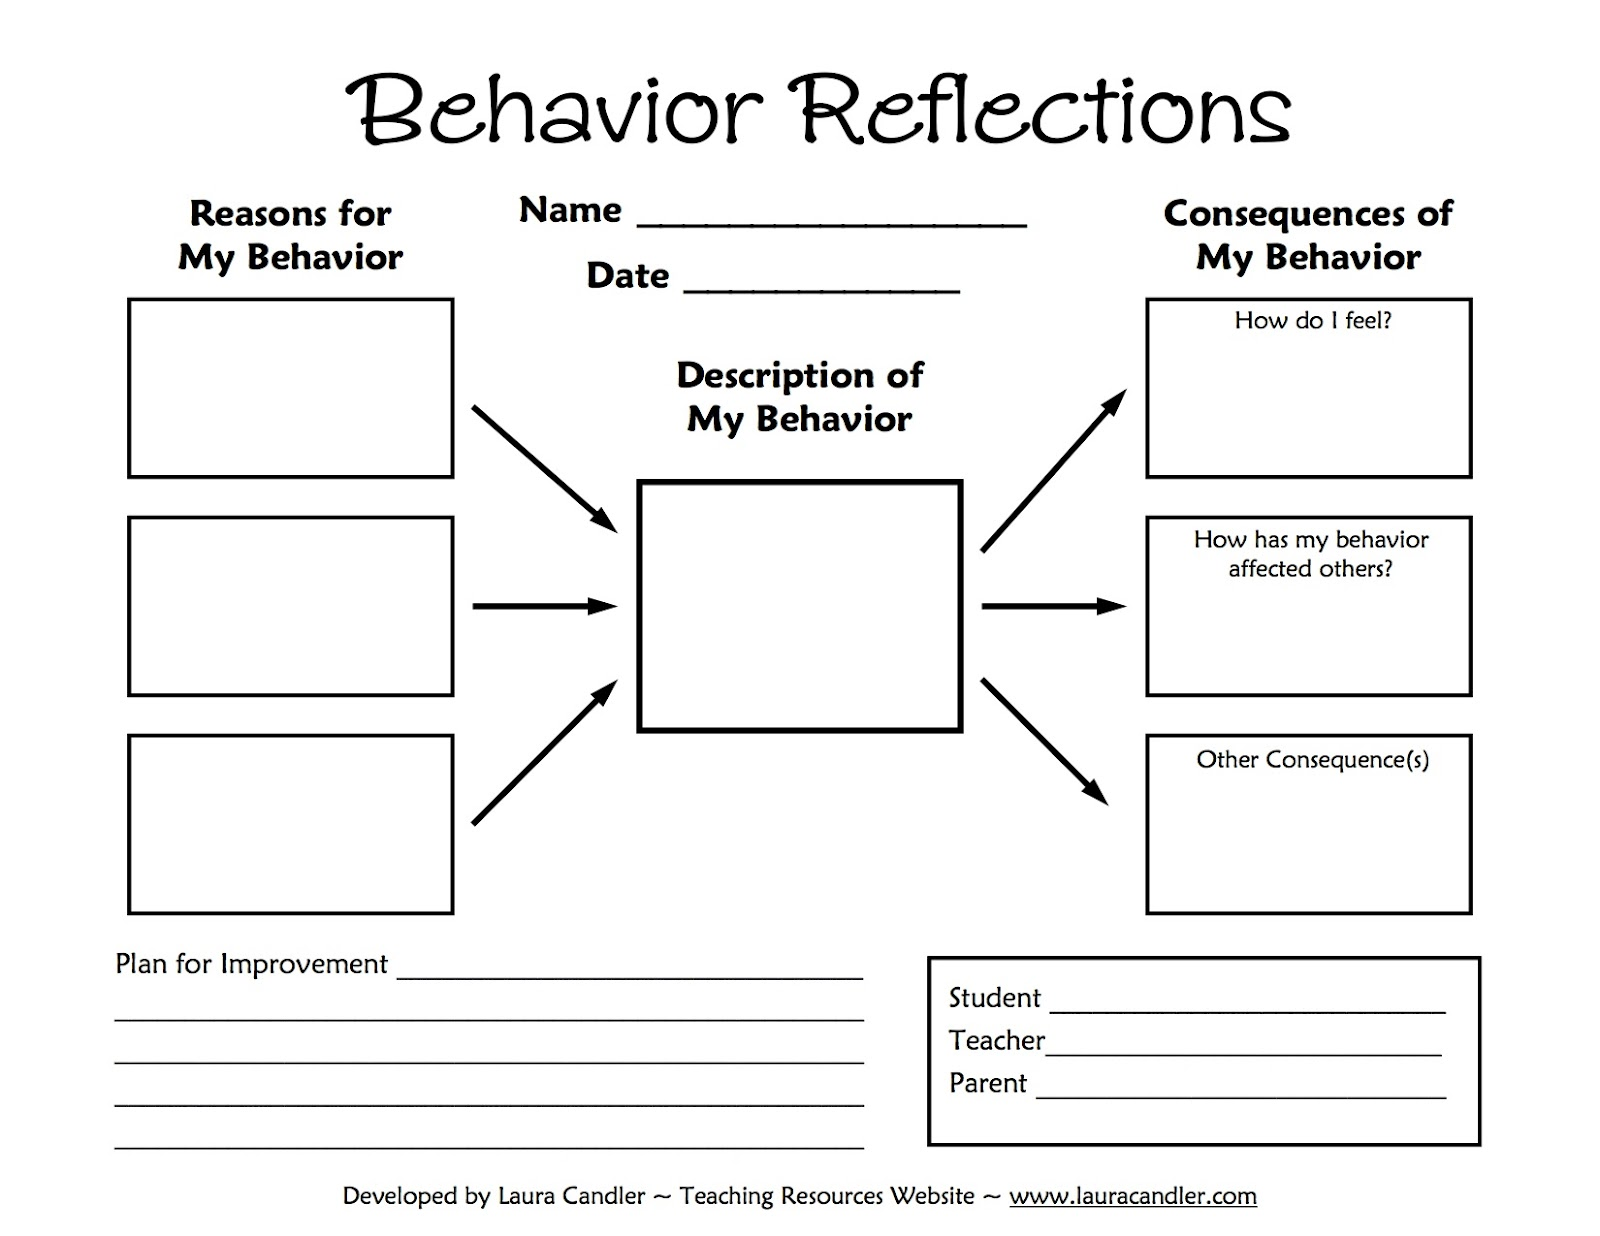 tween teaching behavior reflections sheet